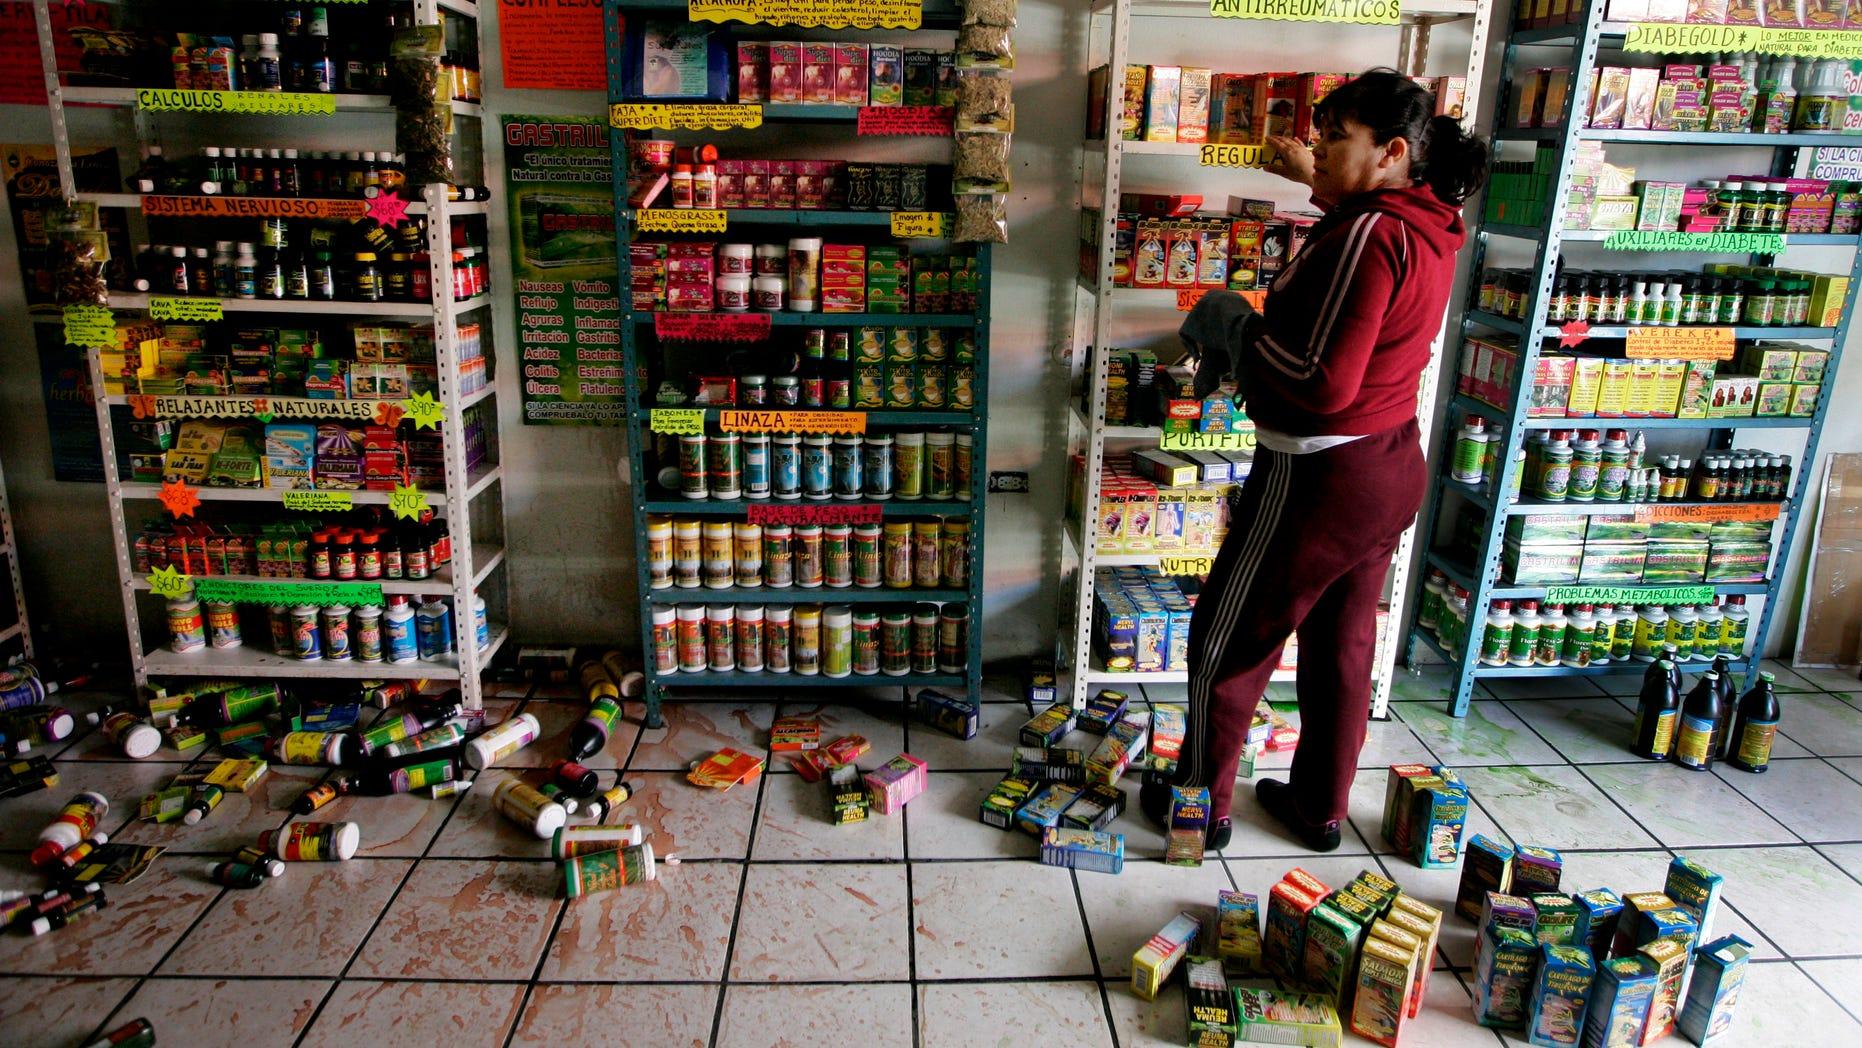 A 6.2 magnitude impacts the Californian coast and La Paz.